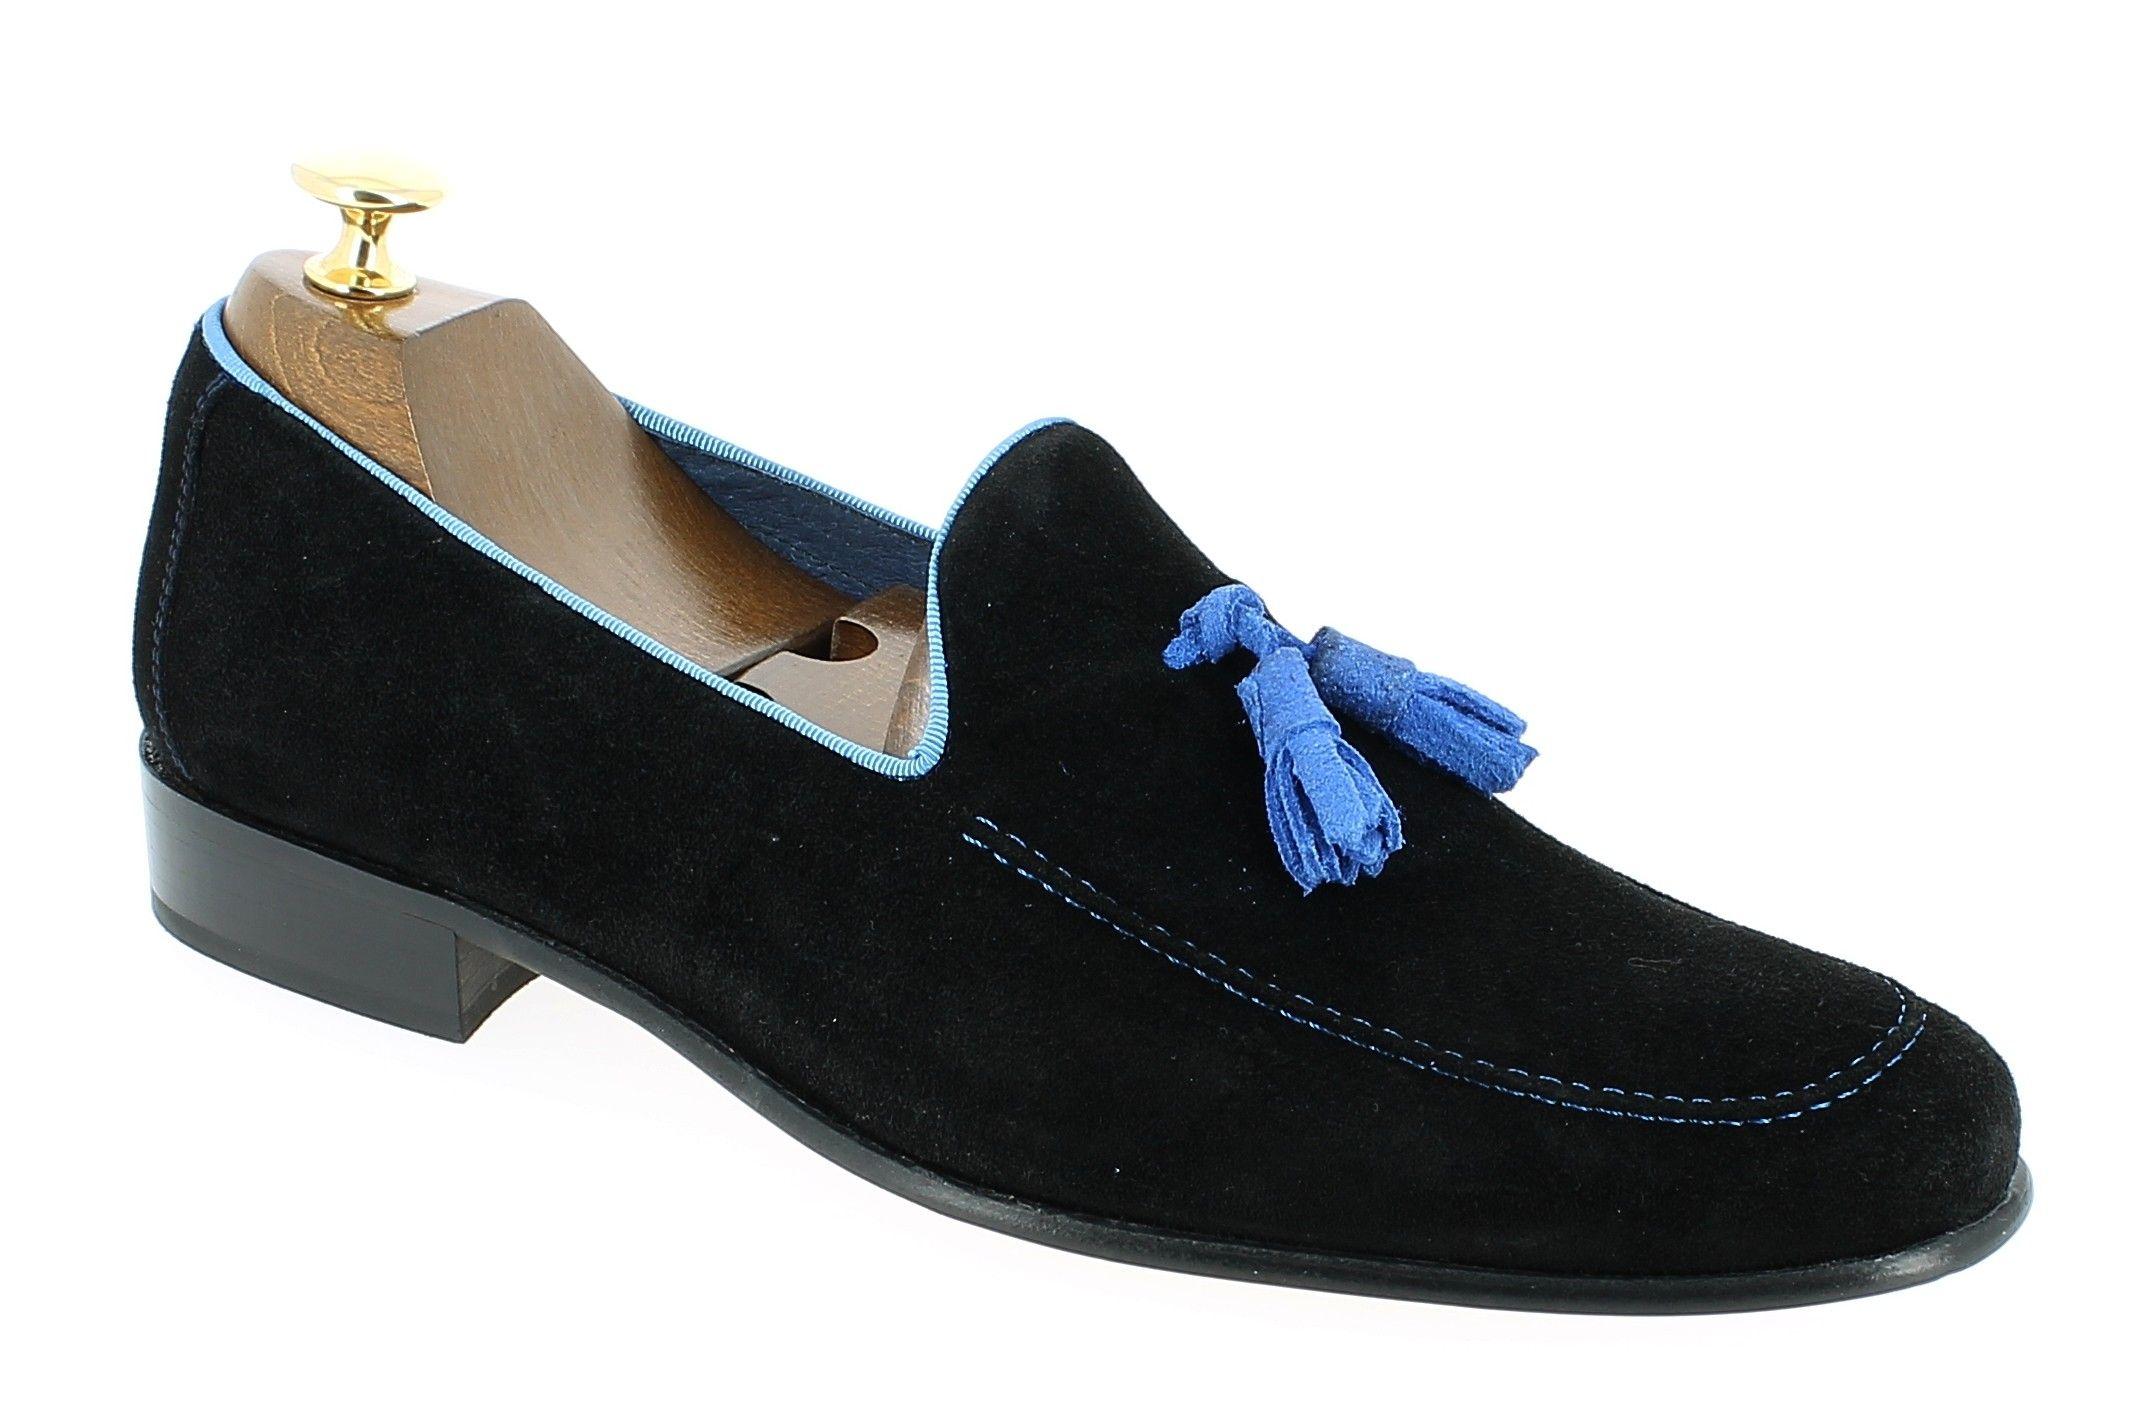 Homme Slip On emblématique Mocassin Chaussures Vernies Cuir Brillant Smart Casual